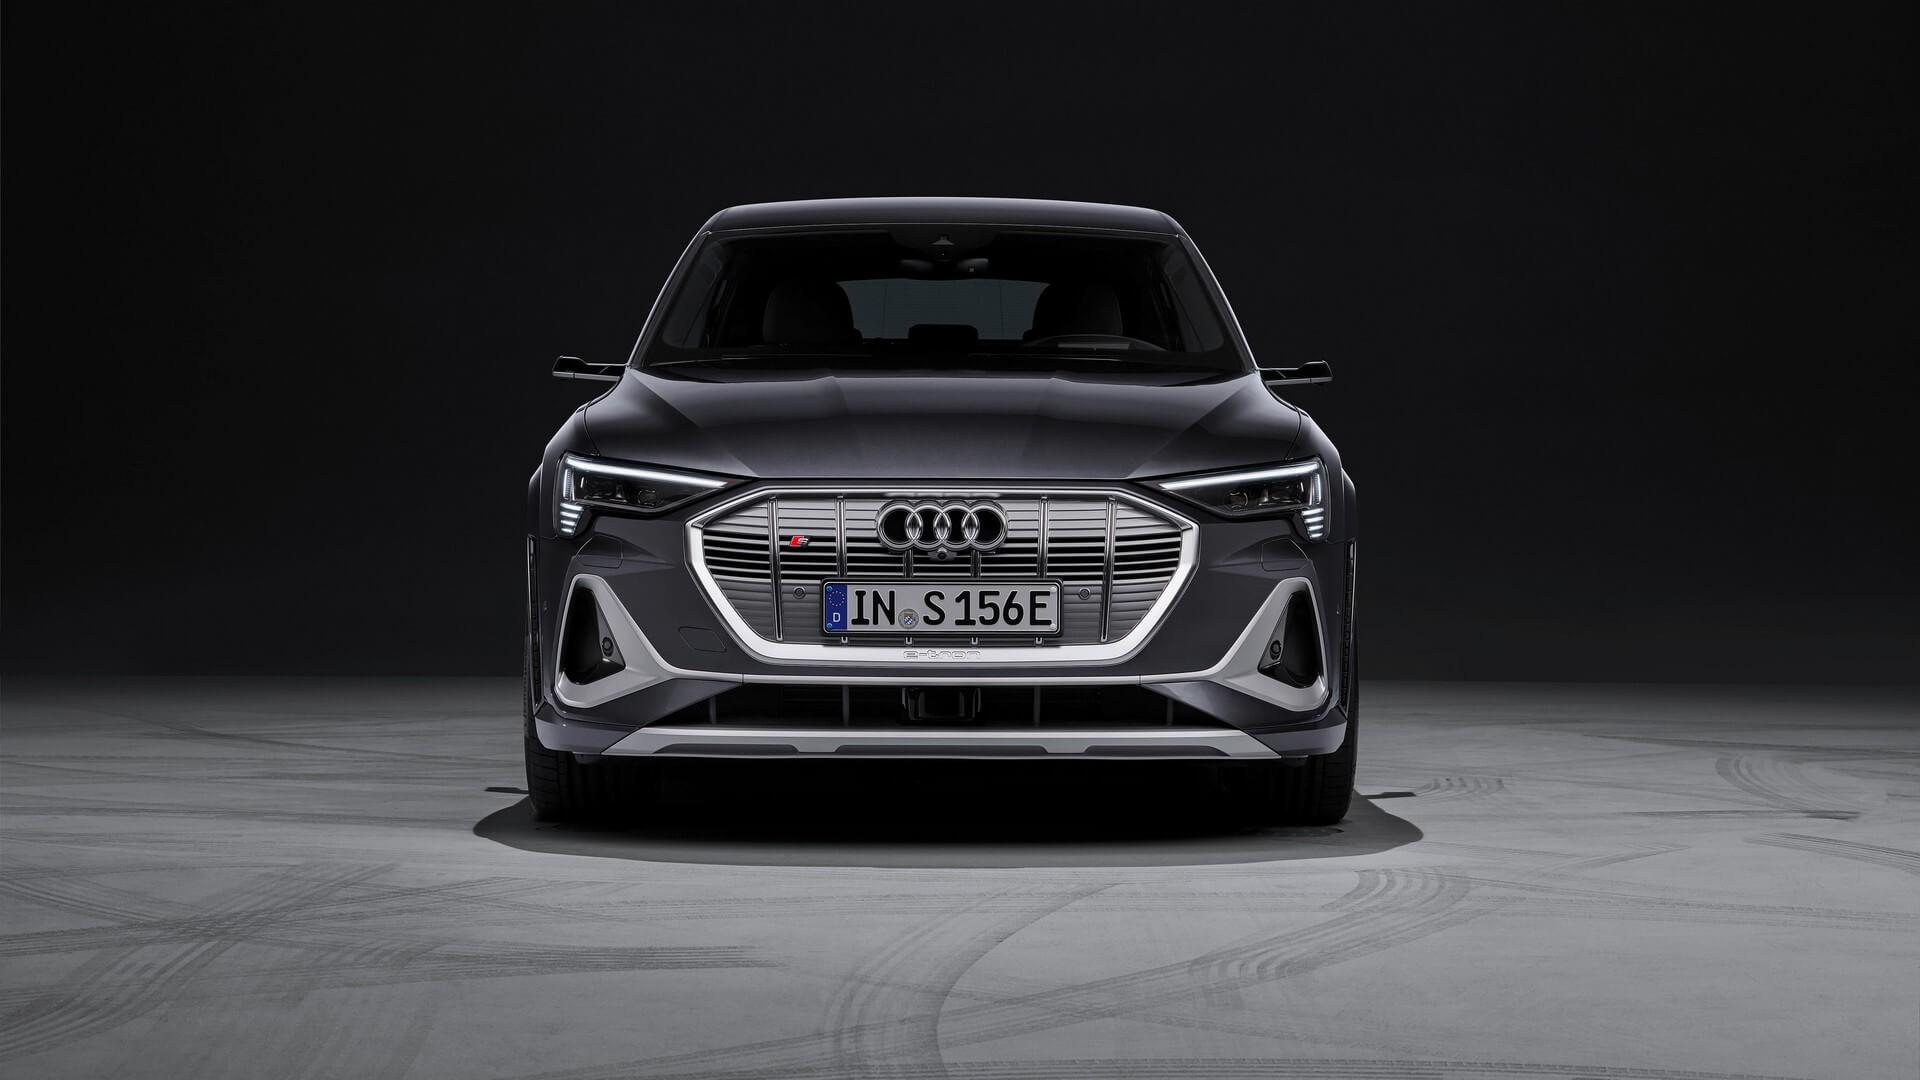 Audi-E-Tron-S-and-E-Tron-S-Sportback-2020-61